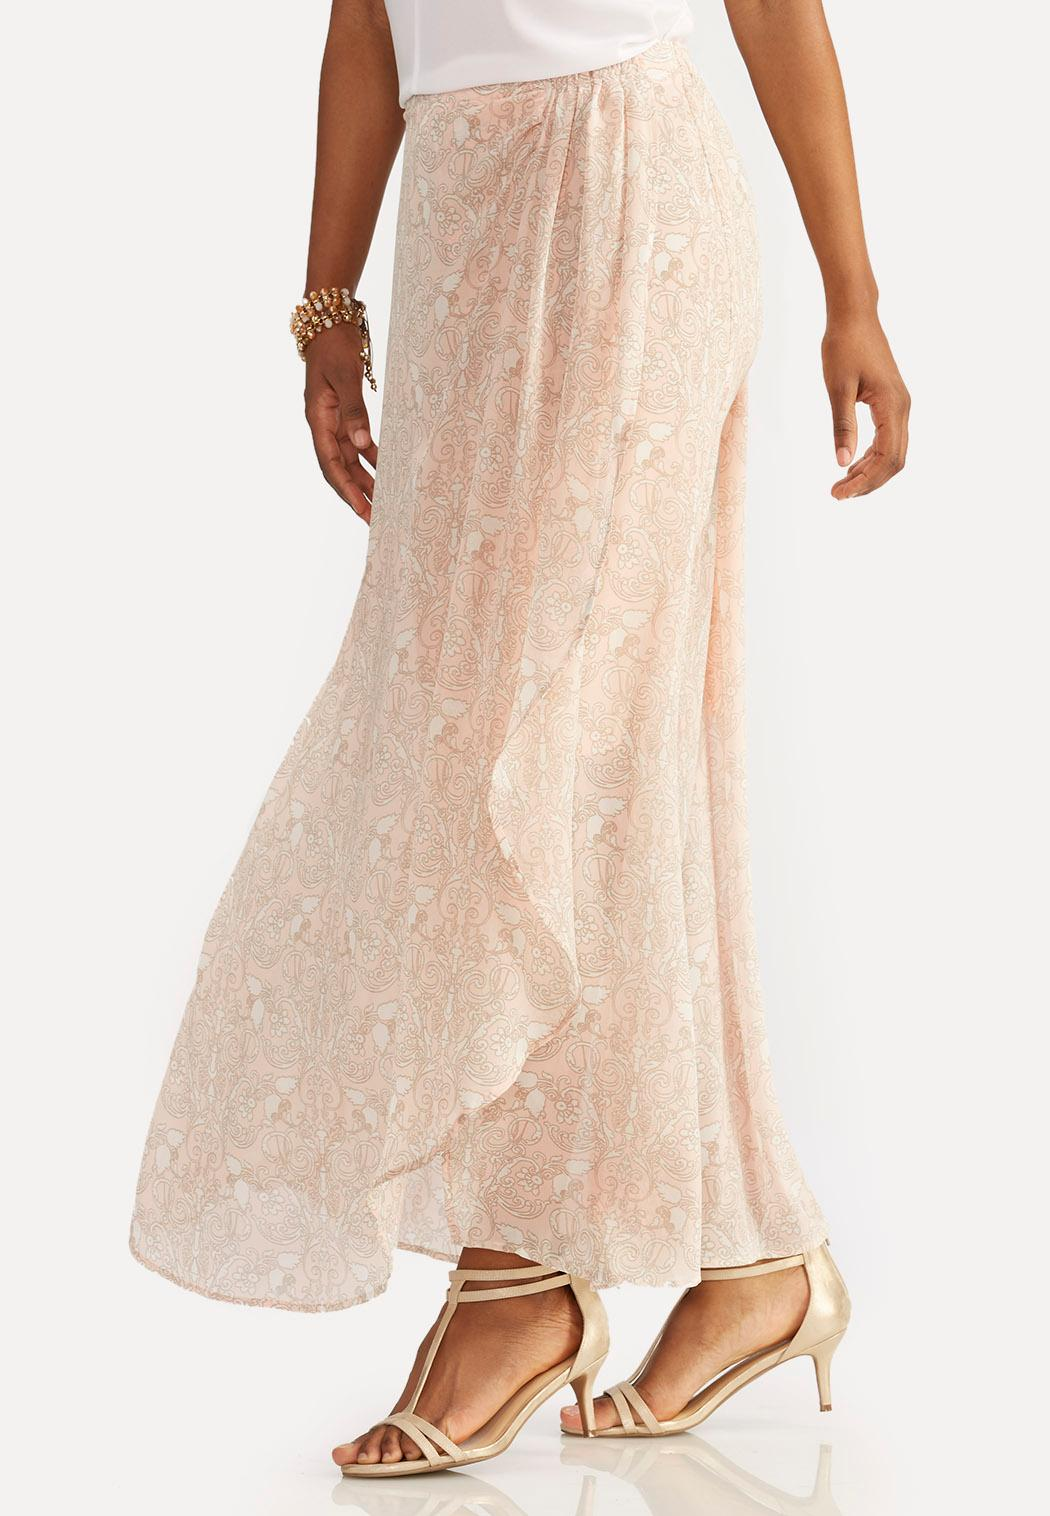 Scroll Damask Wrap Maxi Skirt Plus Maxi Cato Fashions